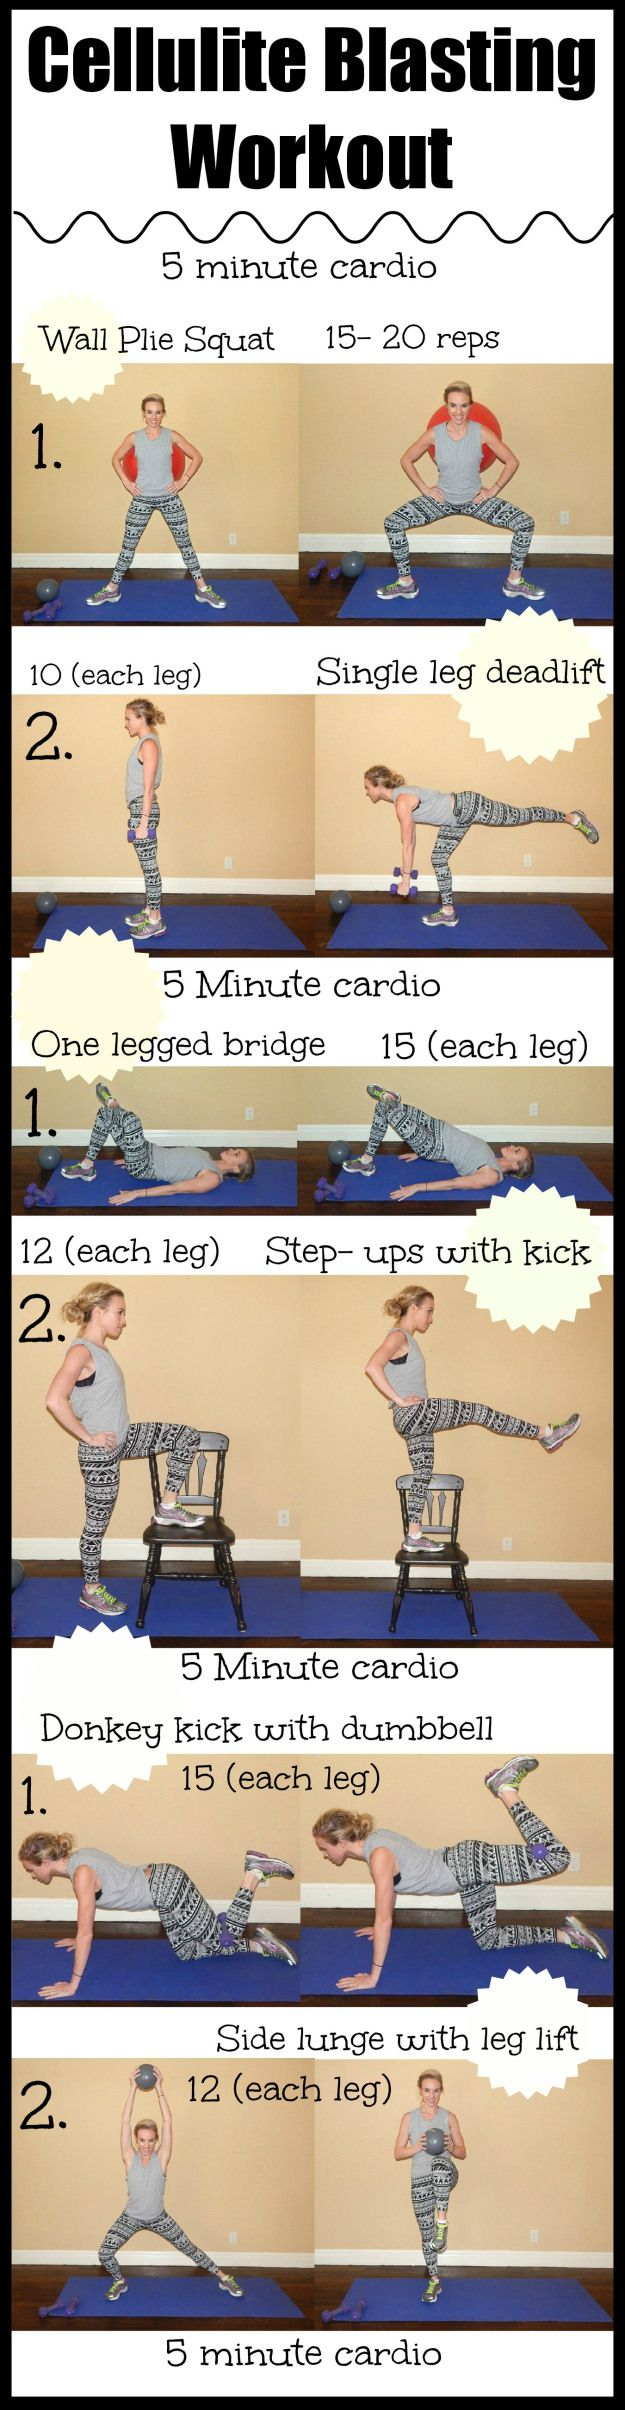 cellulite blasting workout 2